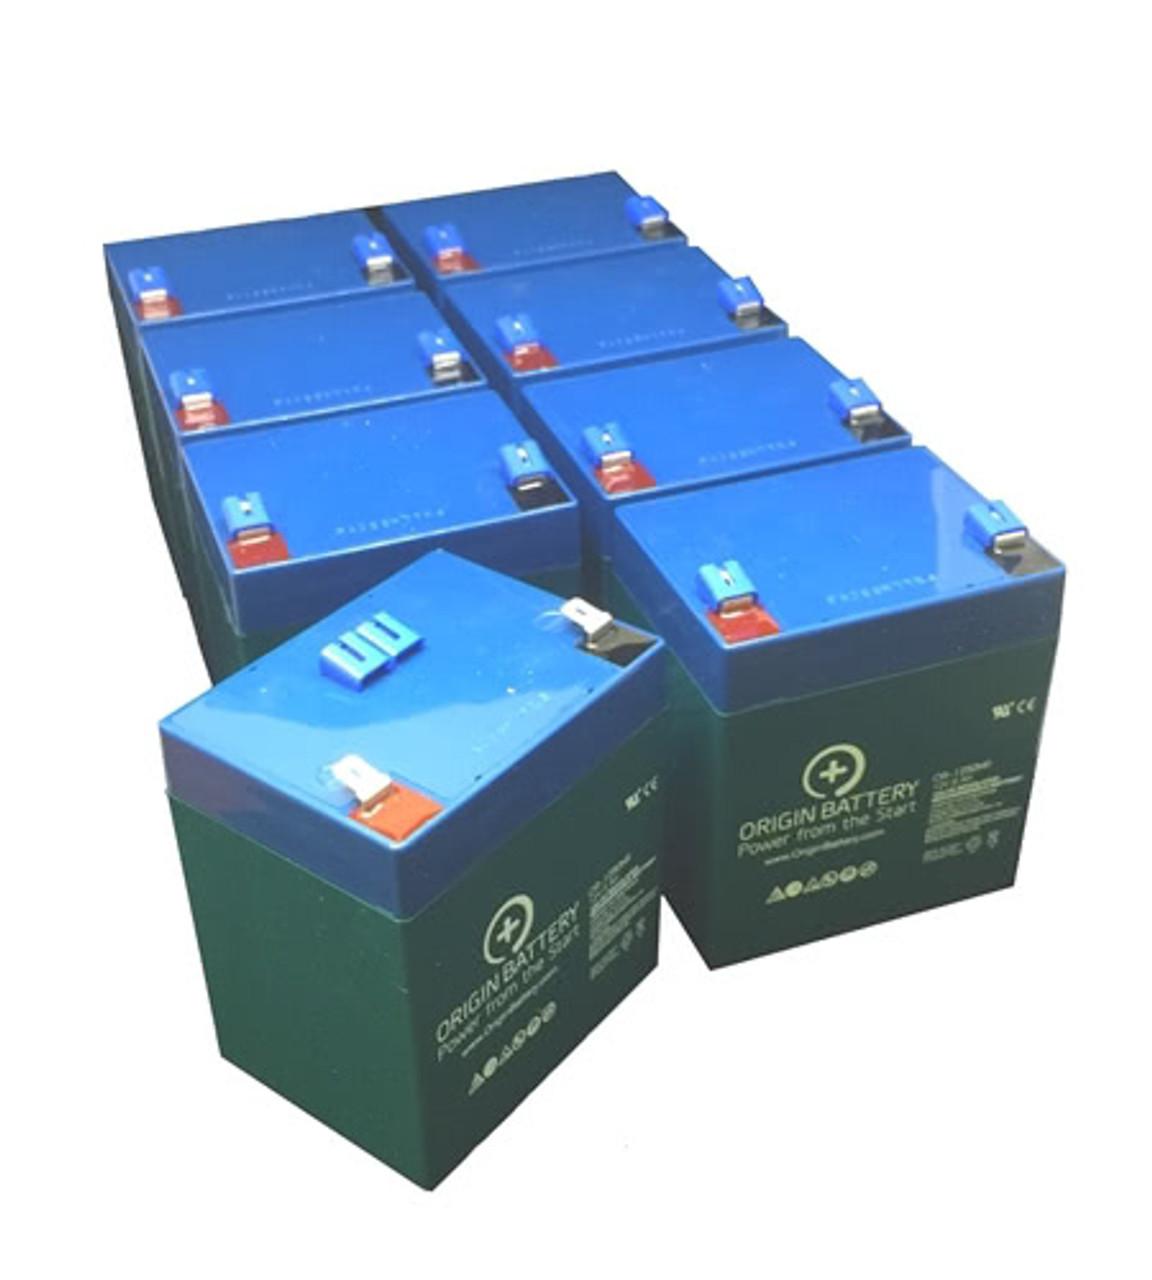 APC Smart-UPS 2200 RackMount 2U 230V SUA2200RMI2U UPSBatteryCenter Compatible Replacement Battery Pack RBC43